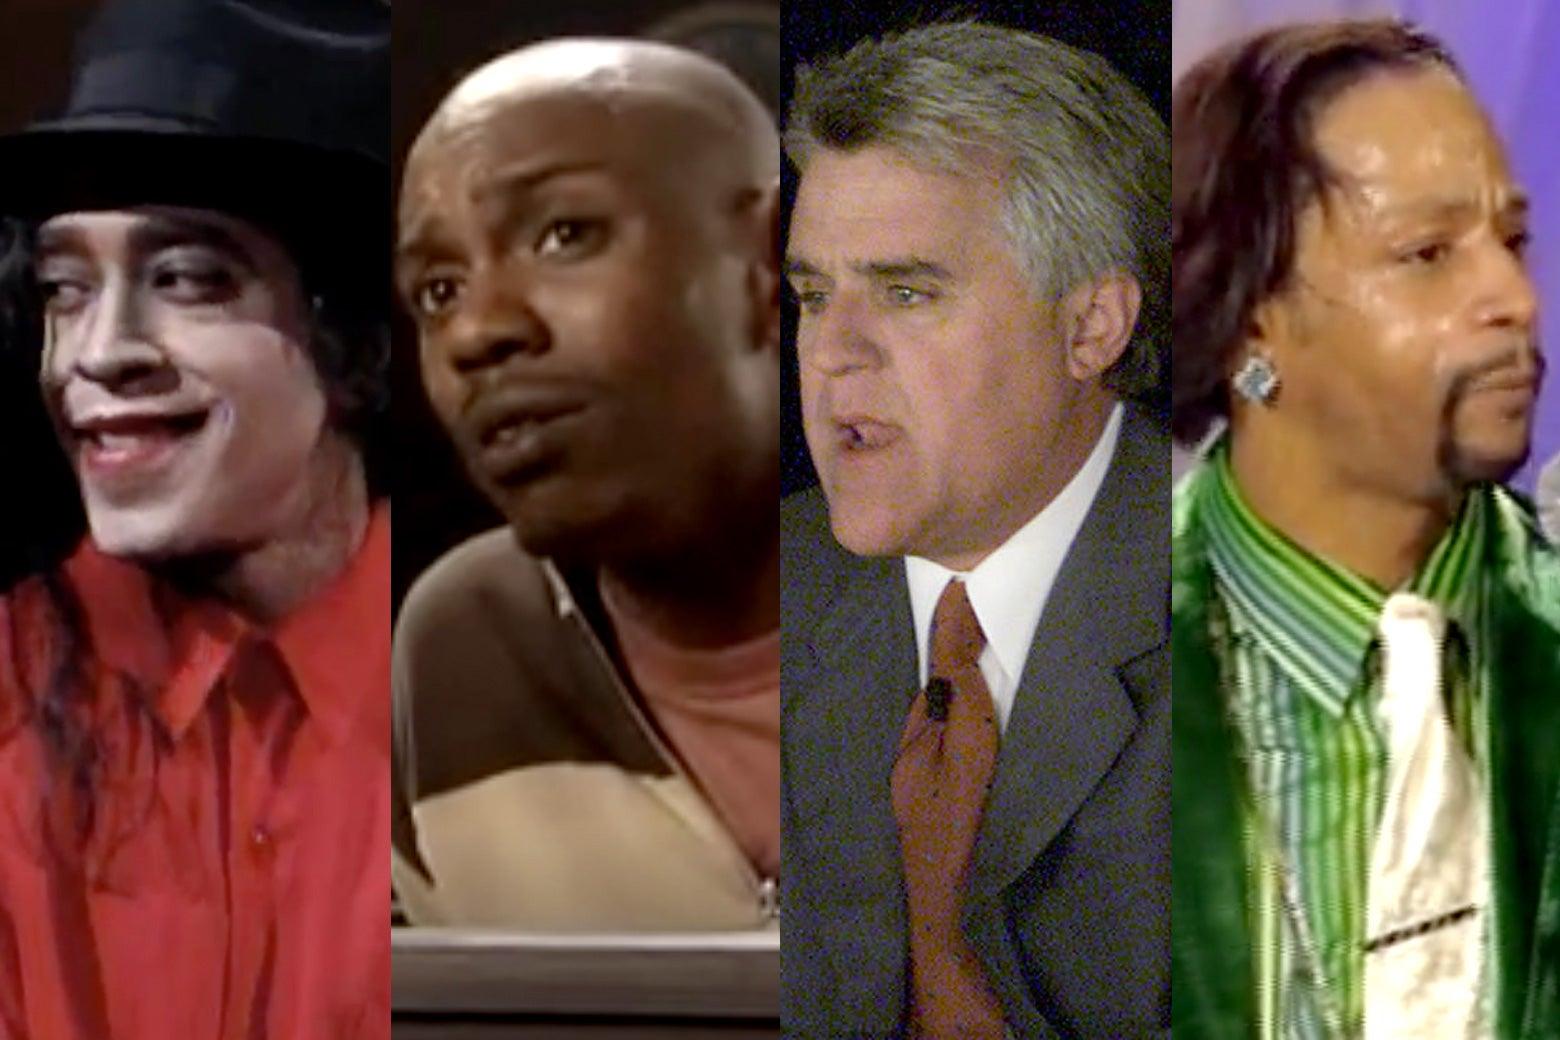 Tim Meadows as Michael Jackson, Dave Chappelle, Jay Leno, and Katt Williams.